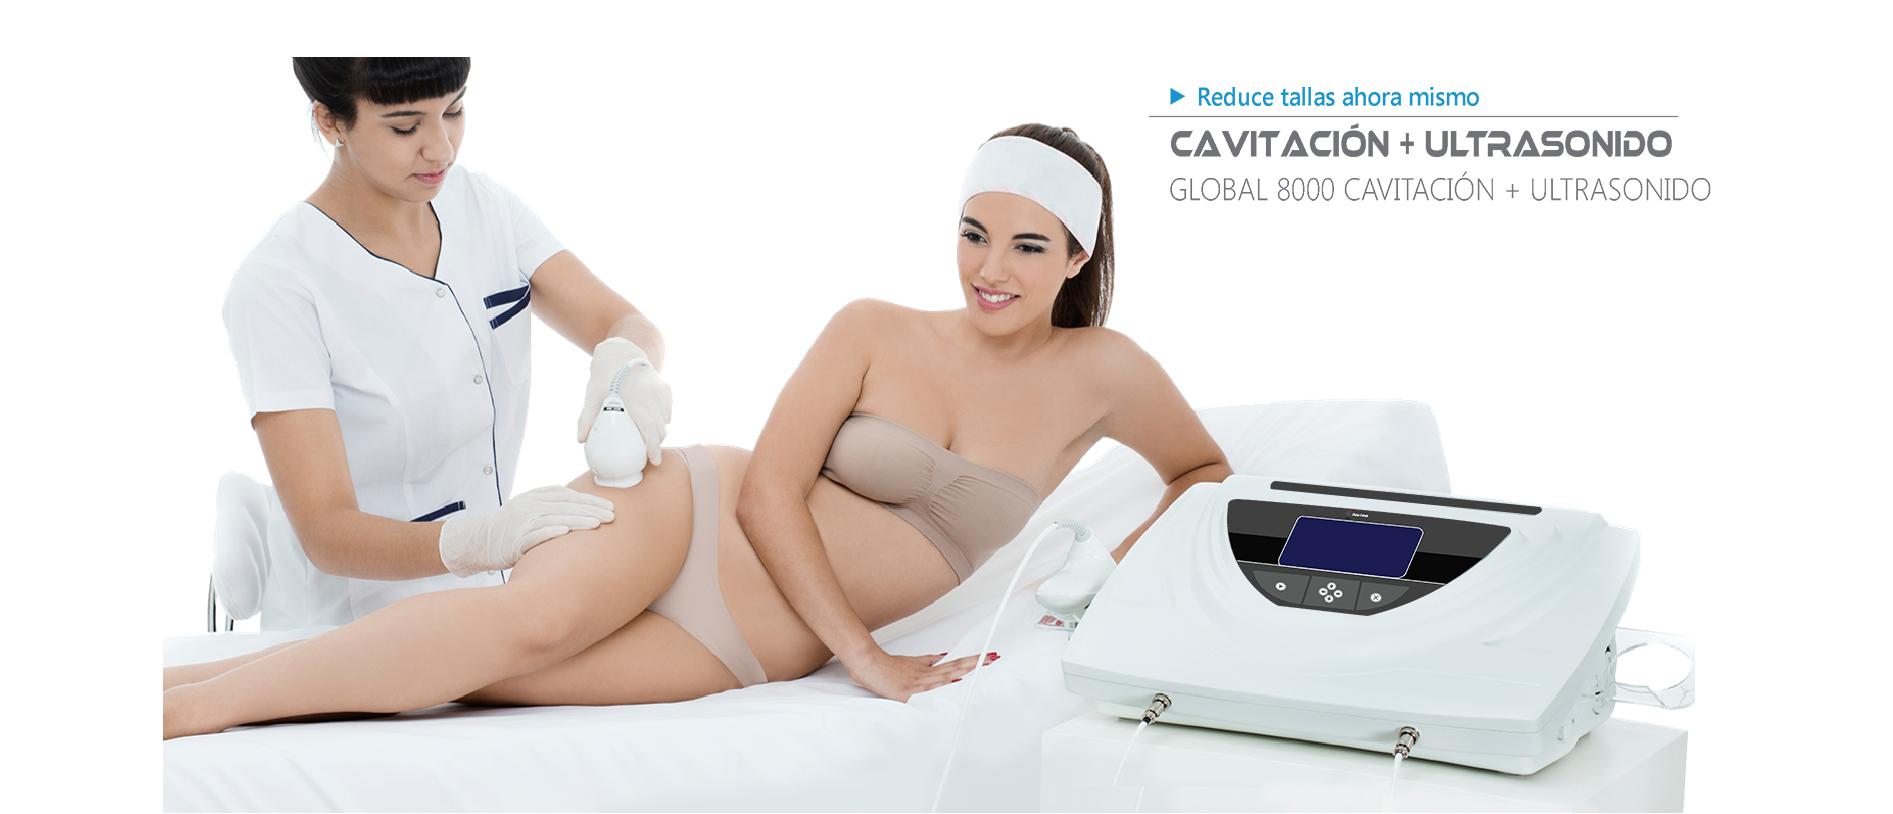 Cavitacion & Ultrasonido